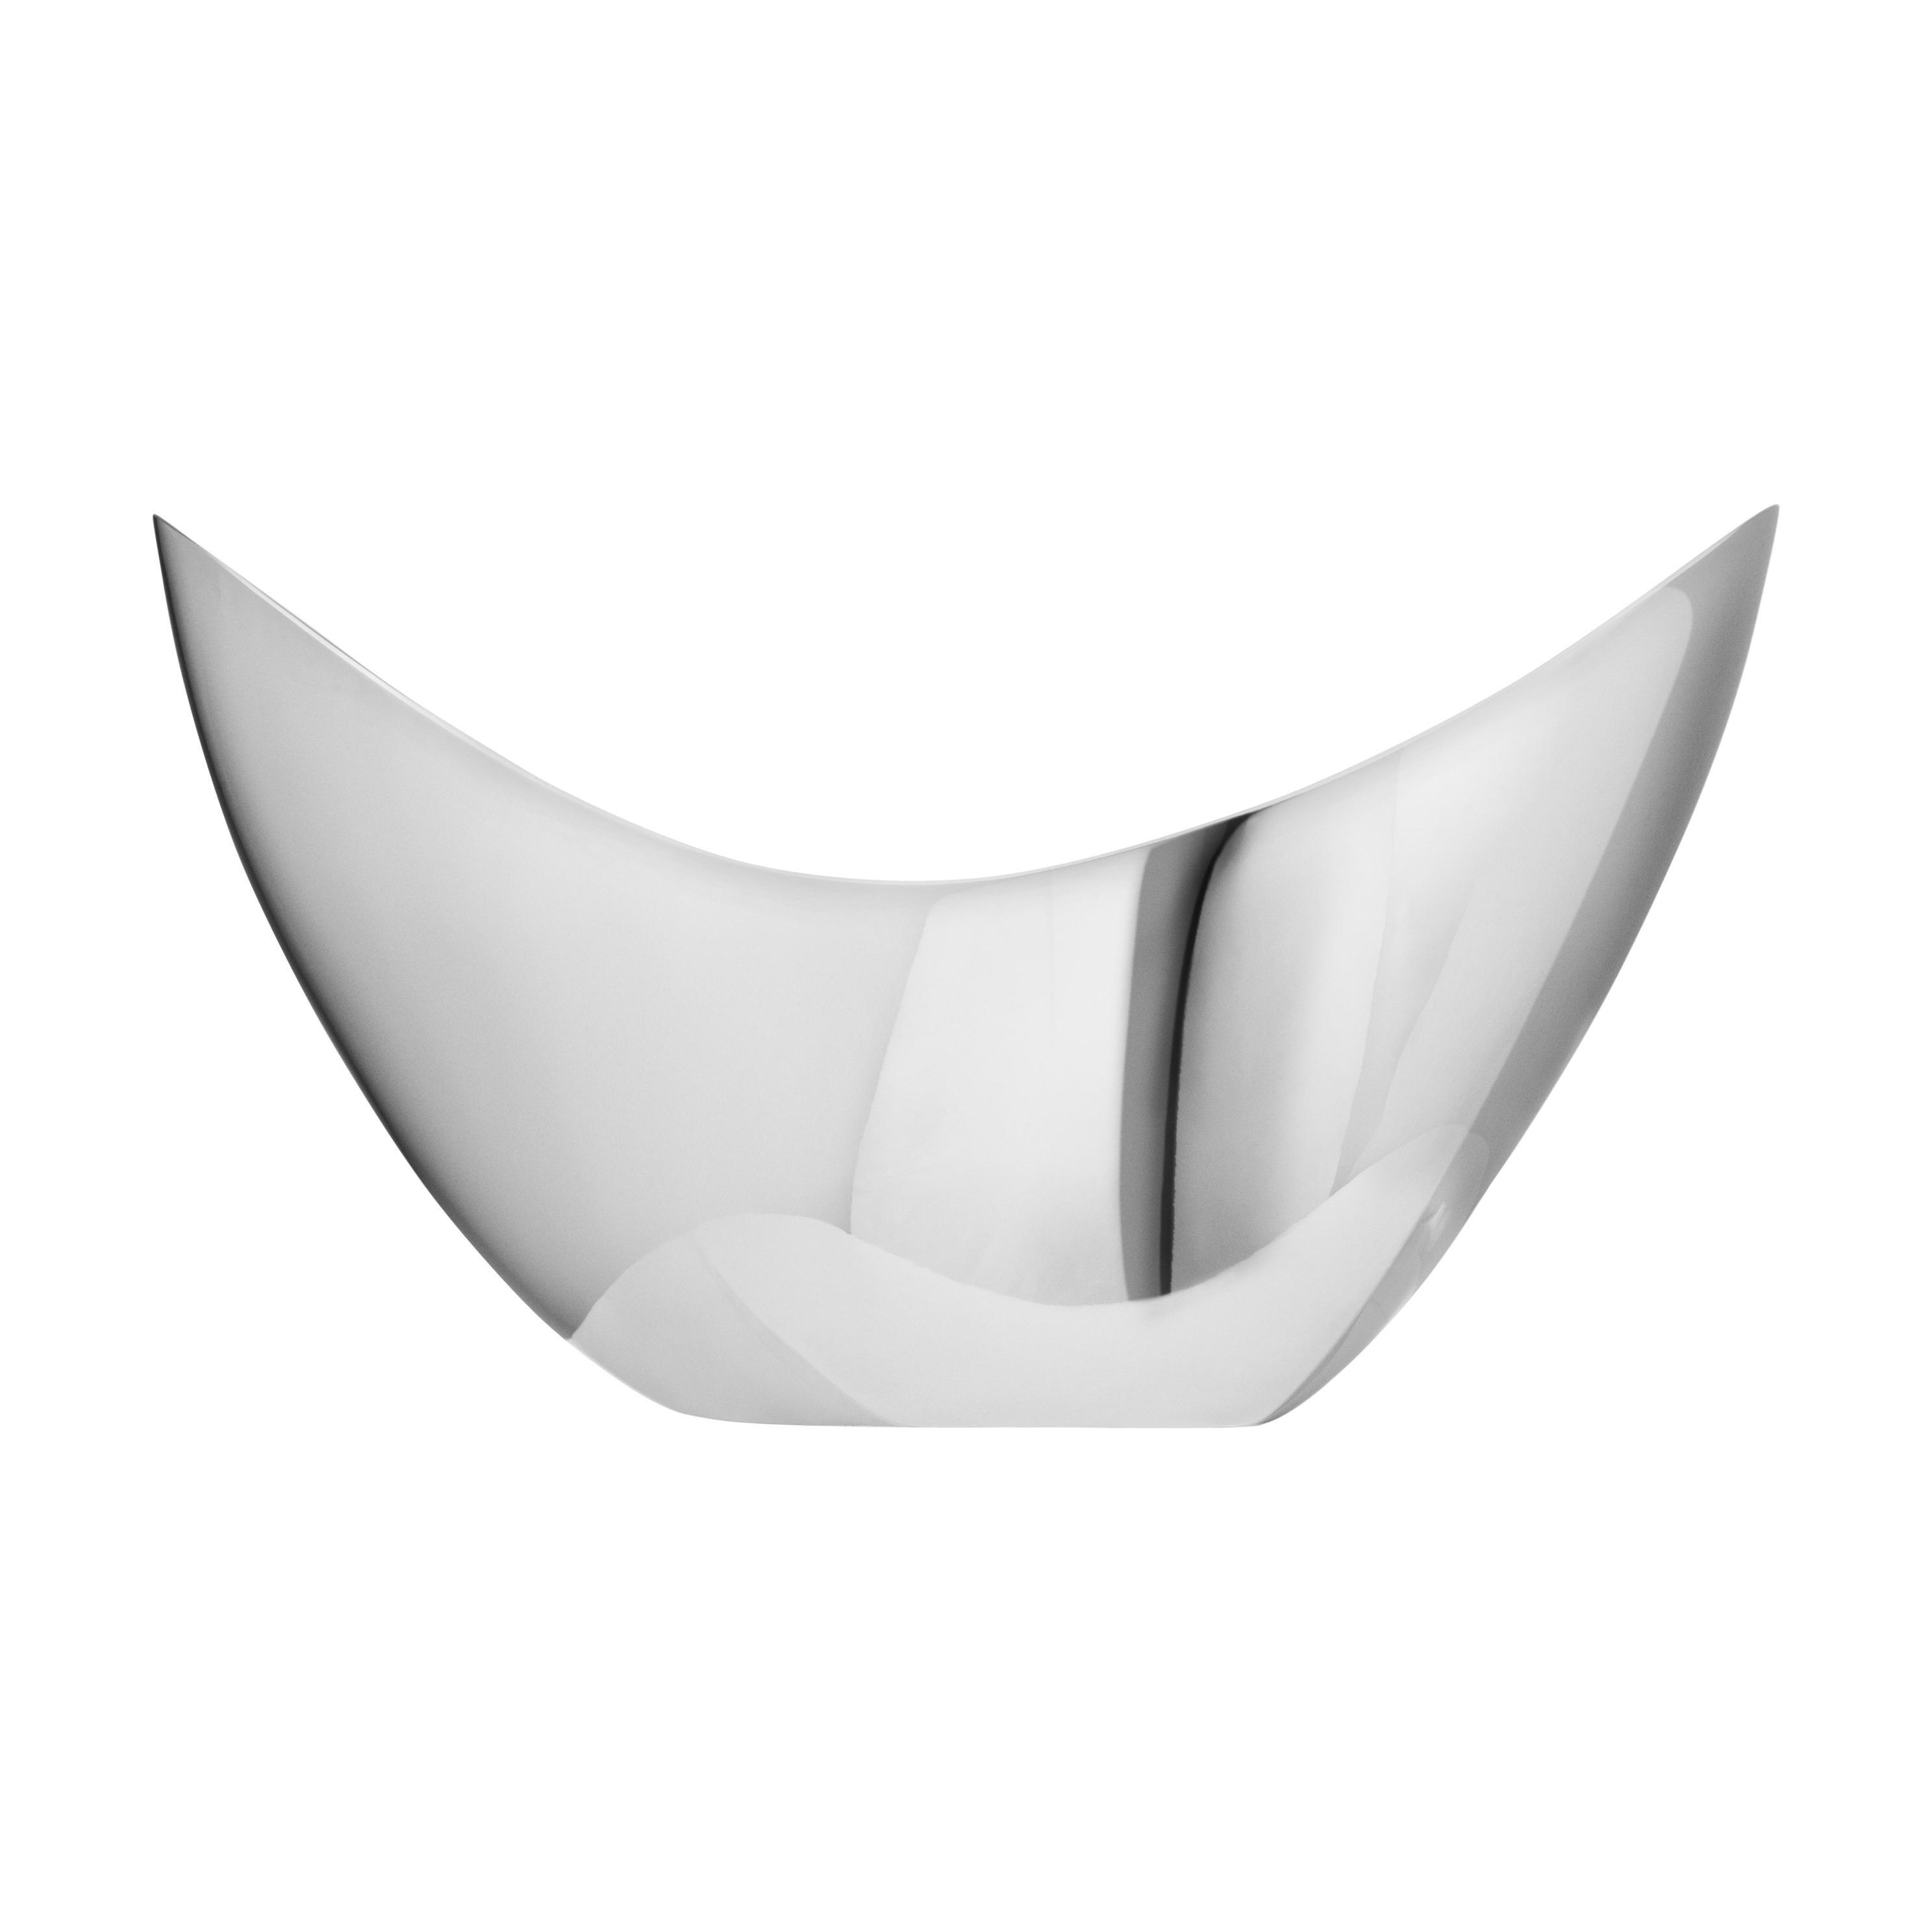 Georg Jensen Bloom Tall Bowl in Stainless Steel Mirror by Helle Damkjær